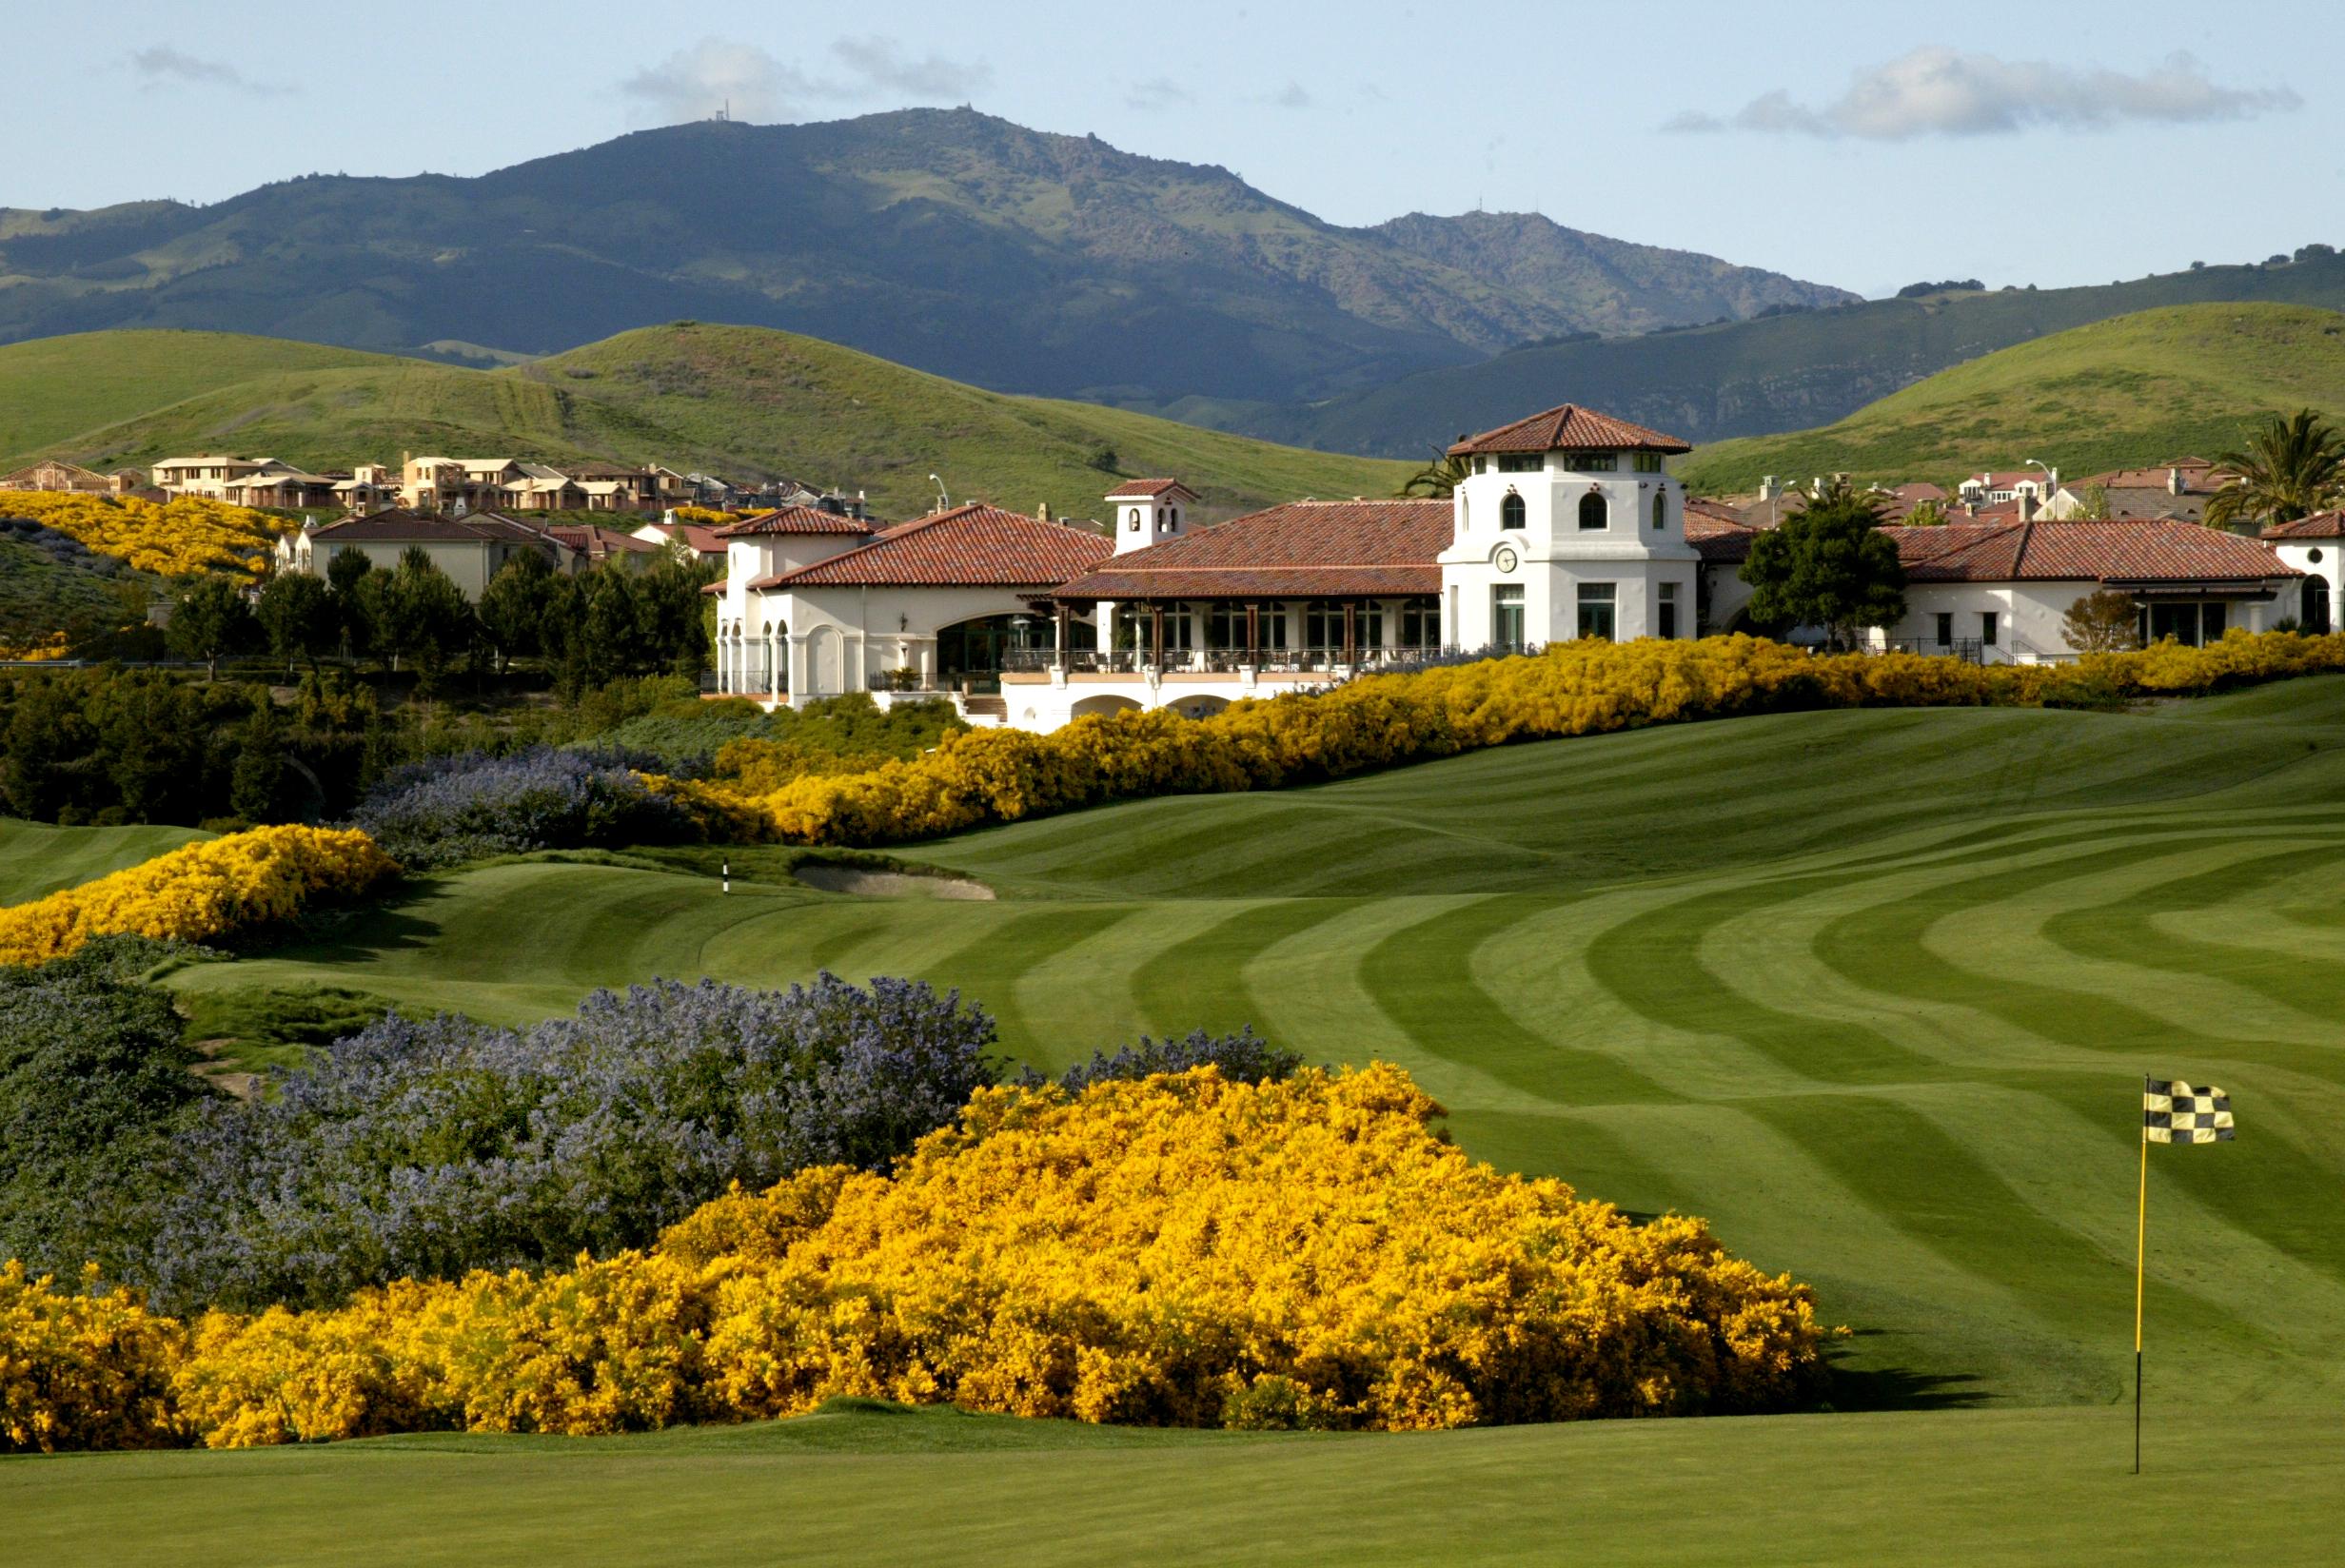 Bridge Golf Club Golf Shop Attendant job in SAN RAMON, CA